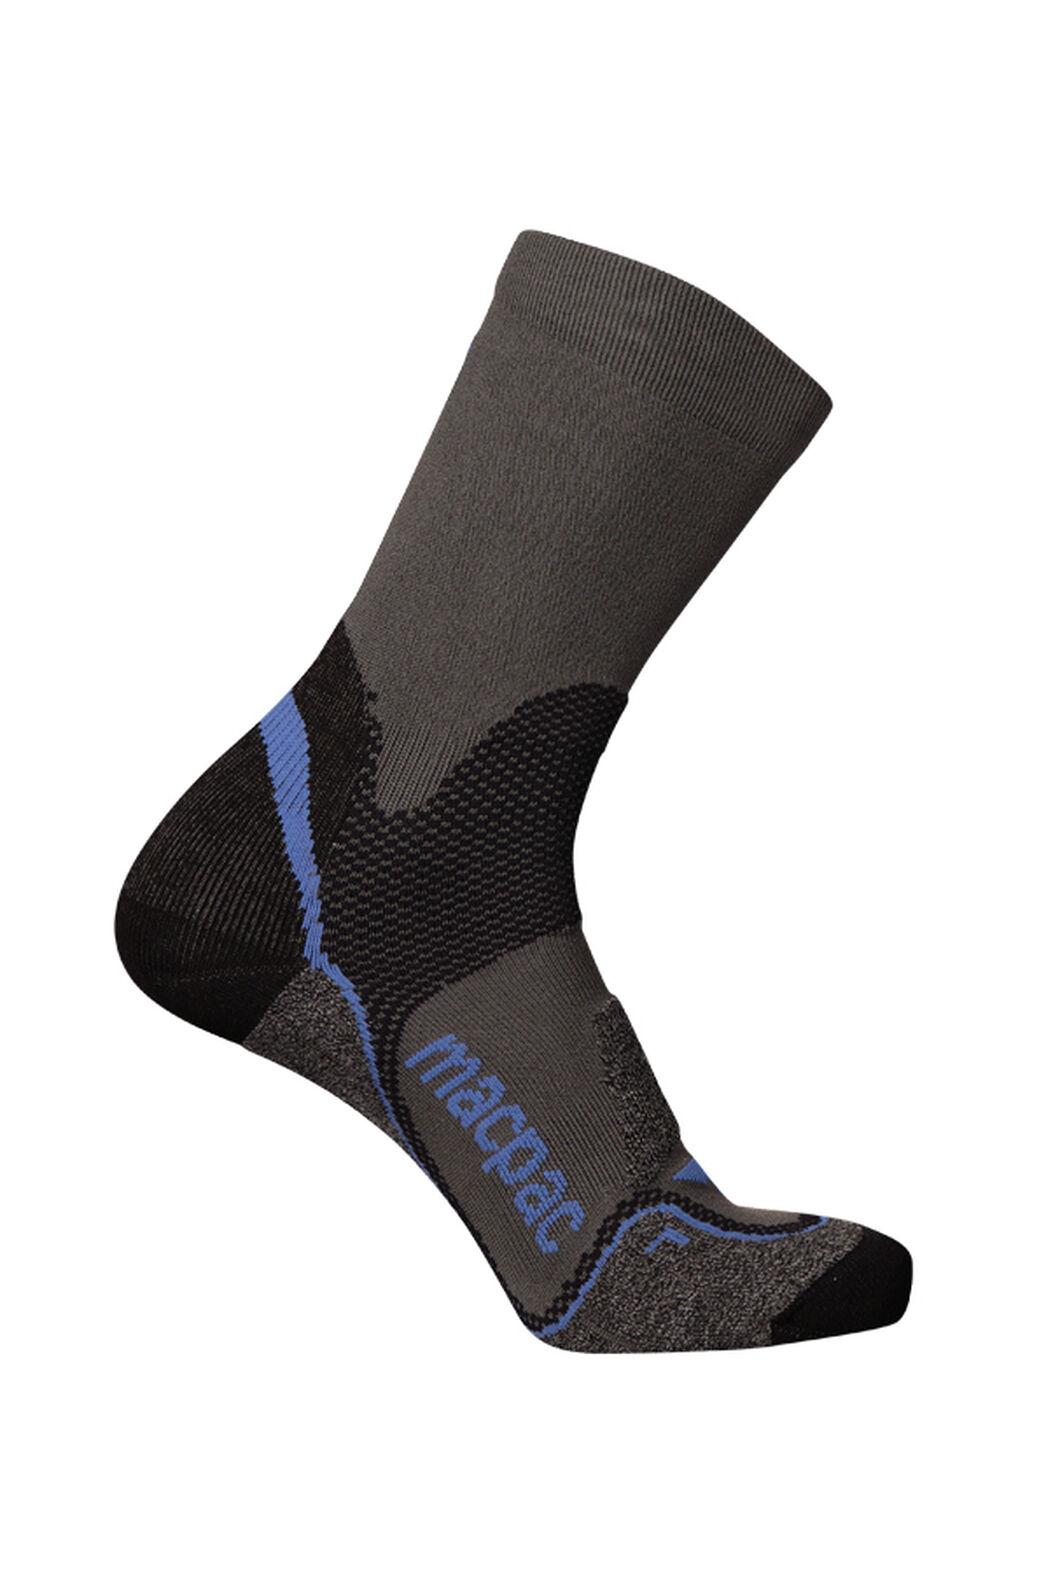 Macpac Fast Hiker Socks, Castlerock, hi-res